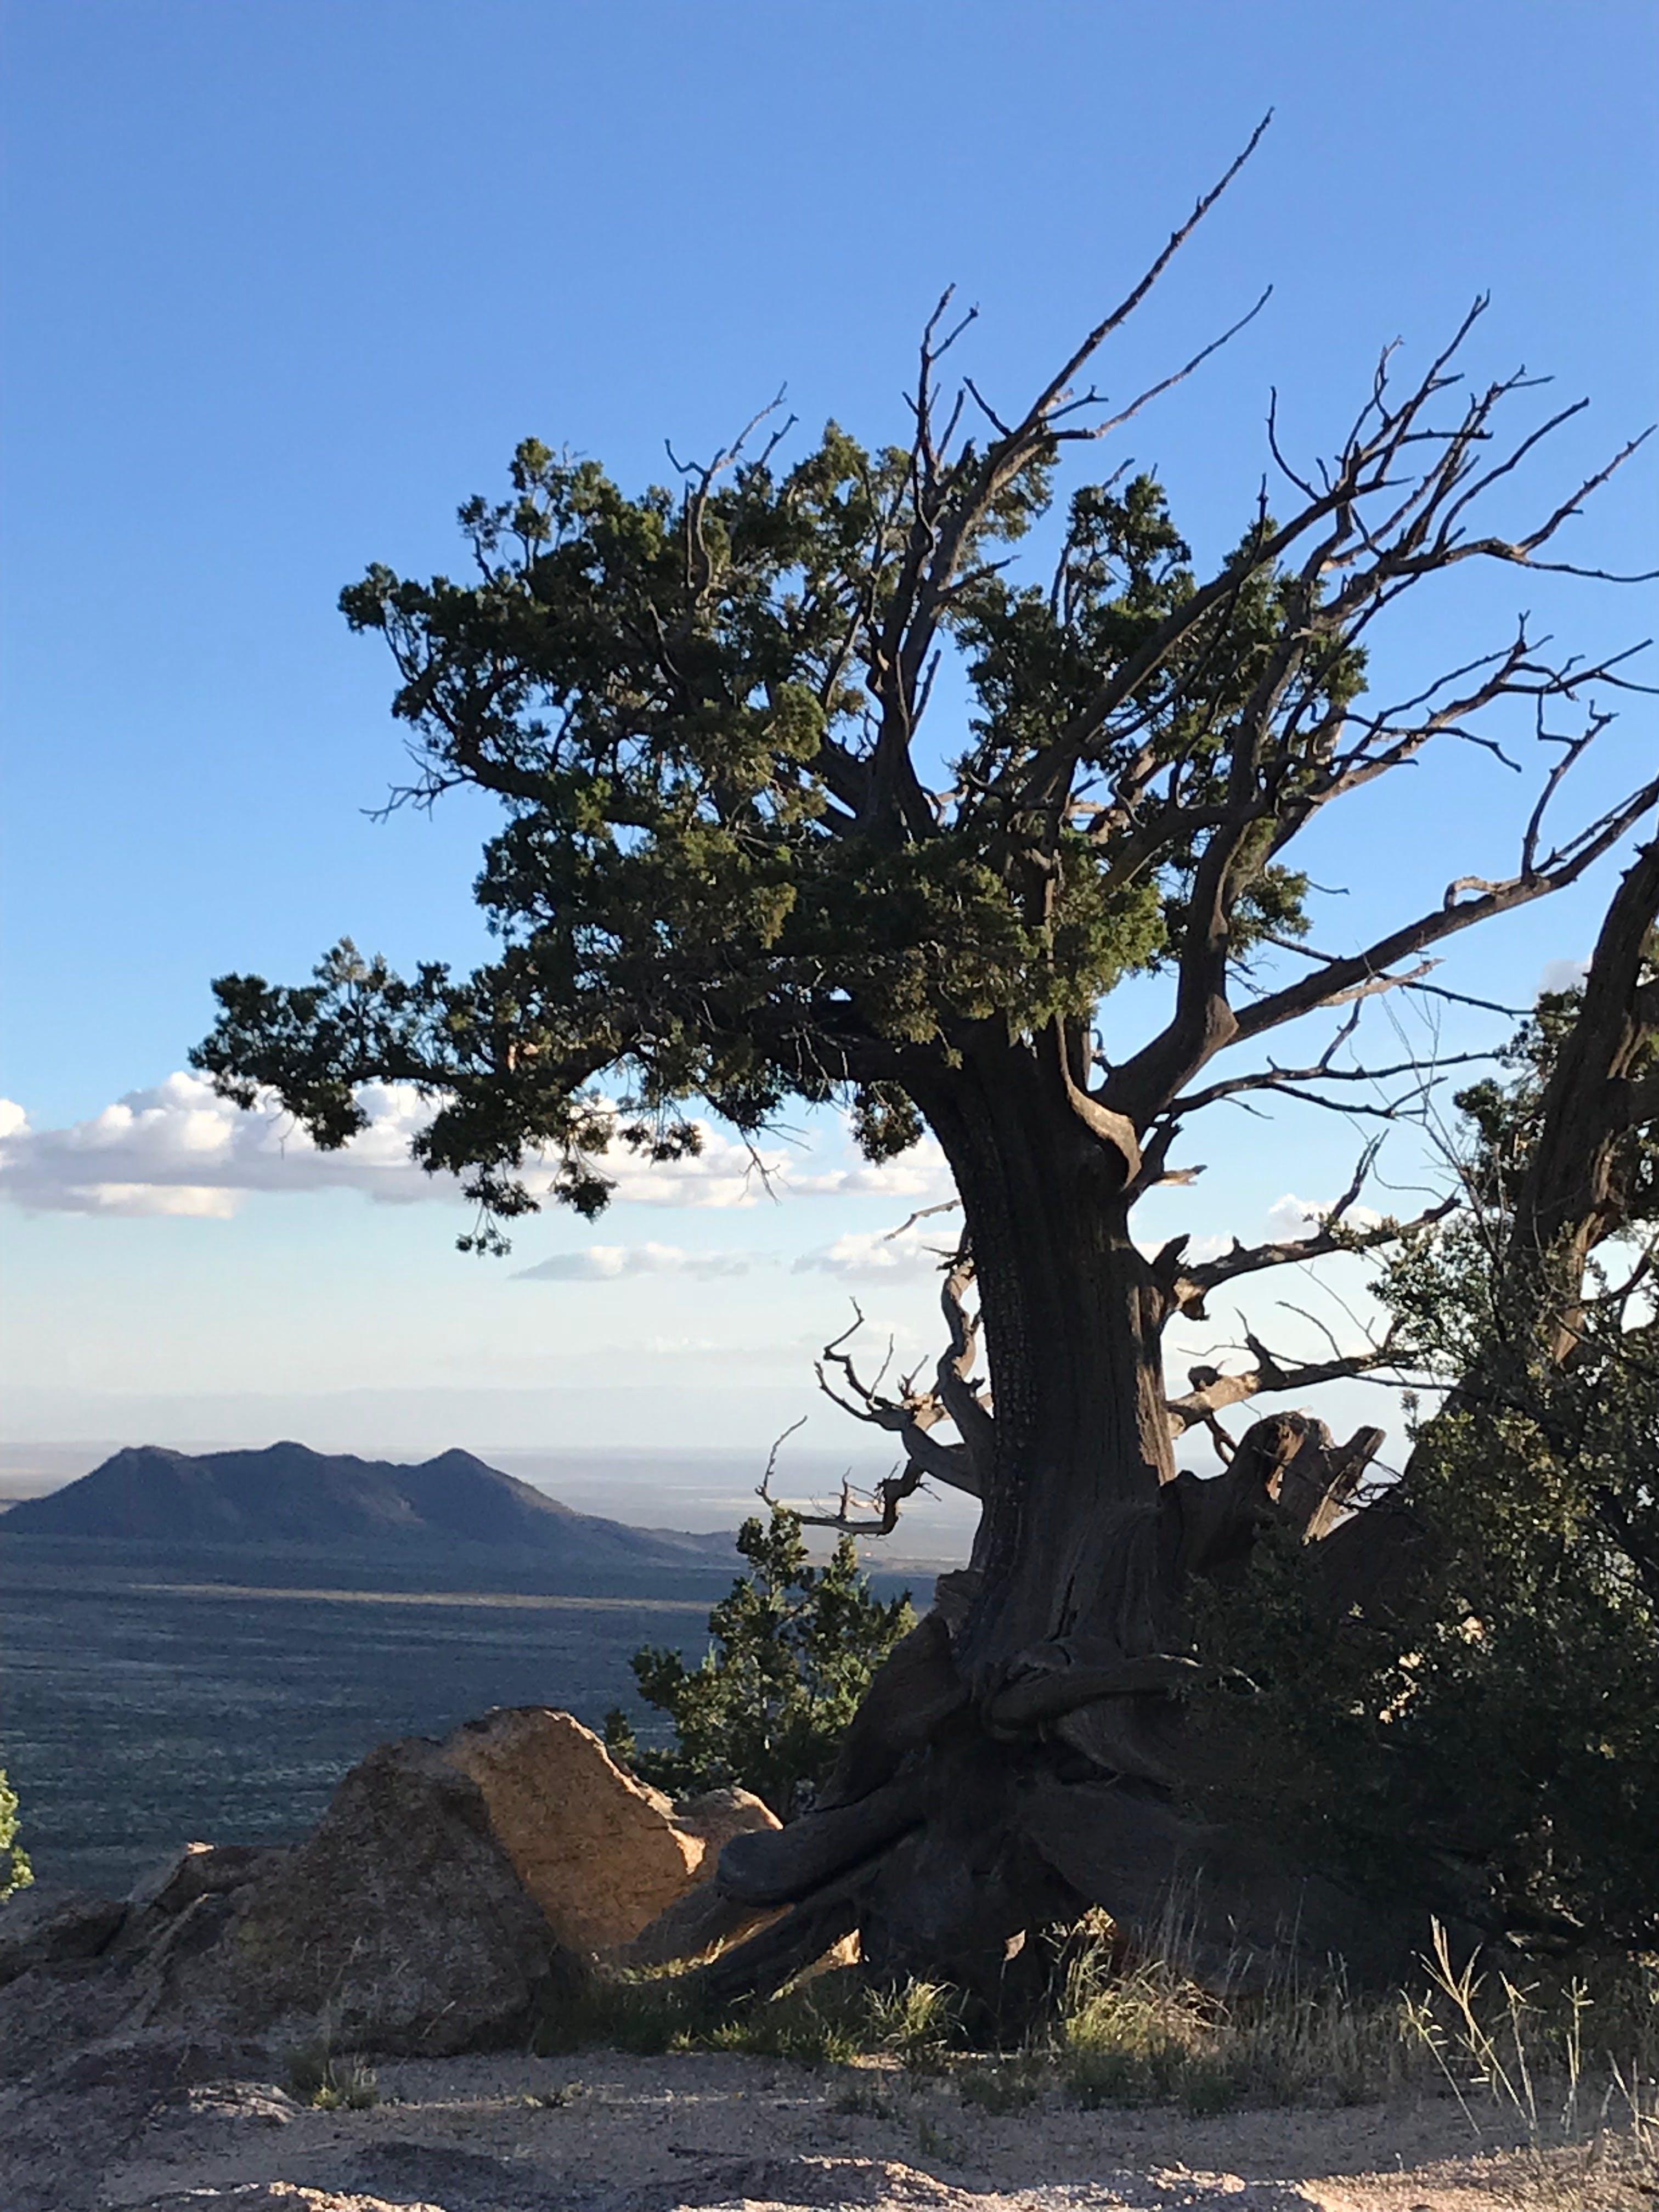 Fotos de stock gratuitas de agua, árbol, cielo, escénico